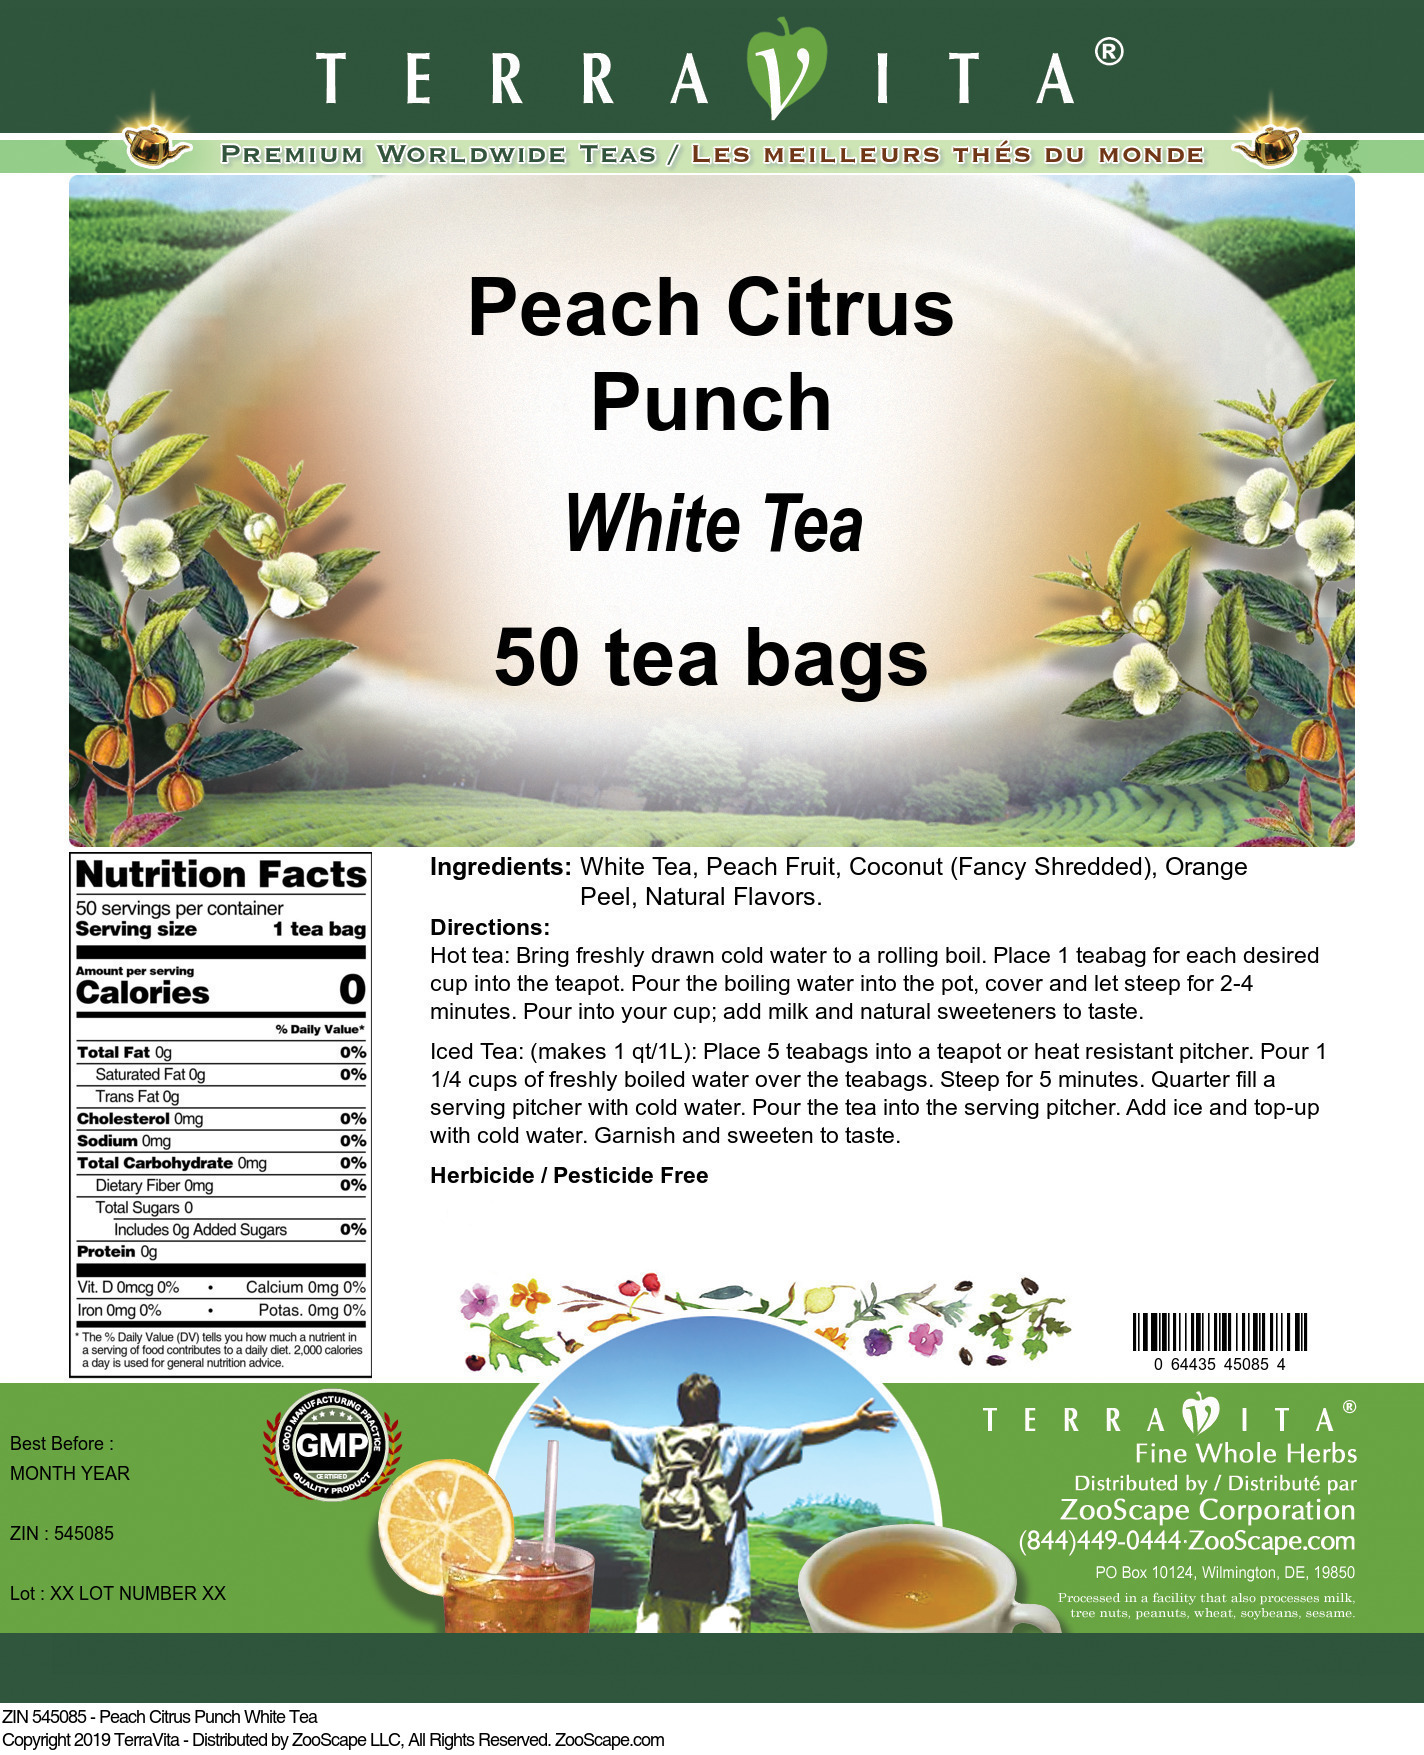 Peach Citrus Punch White Tea